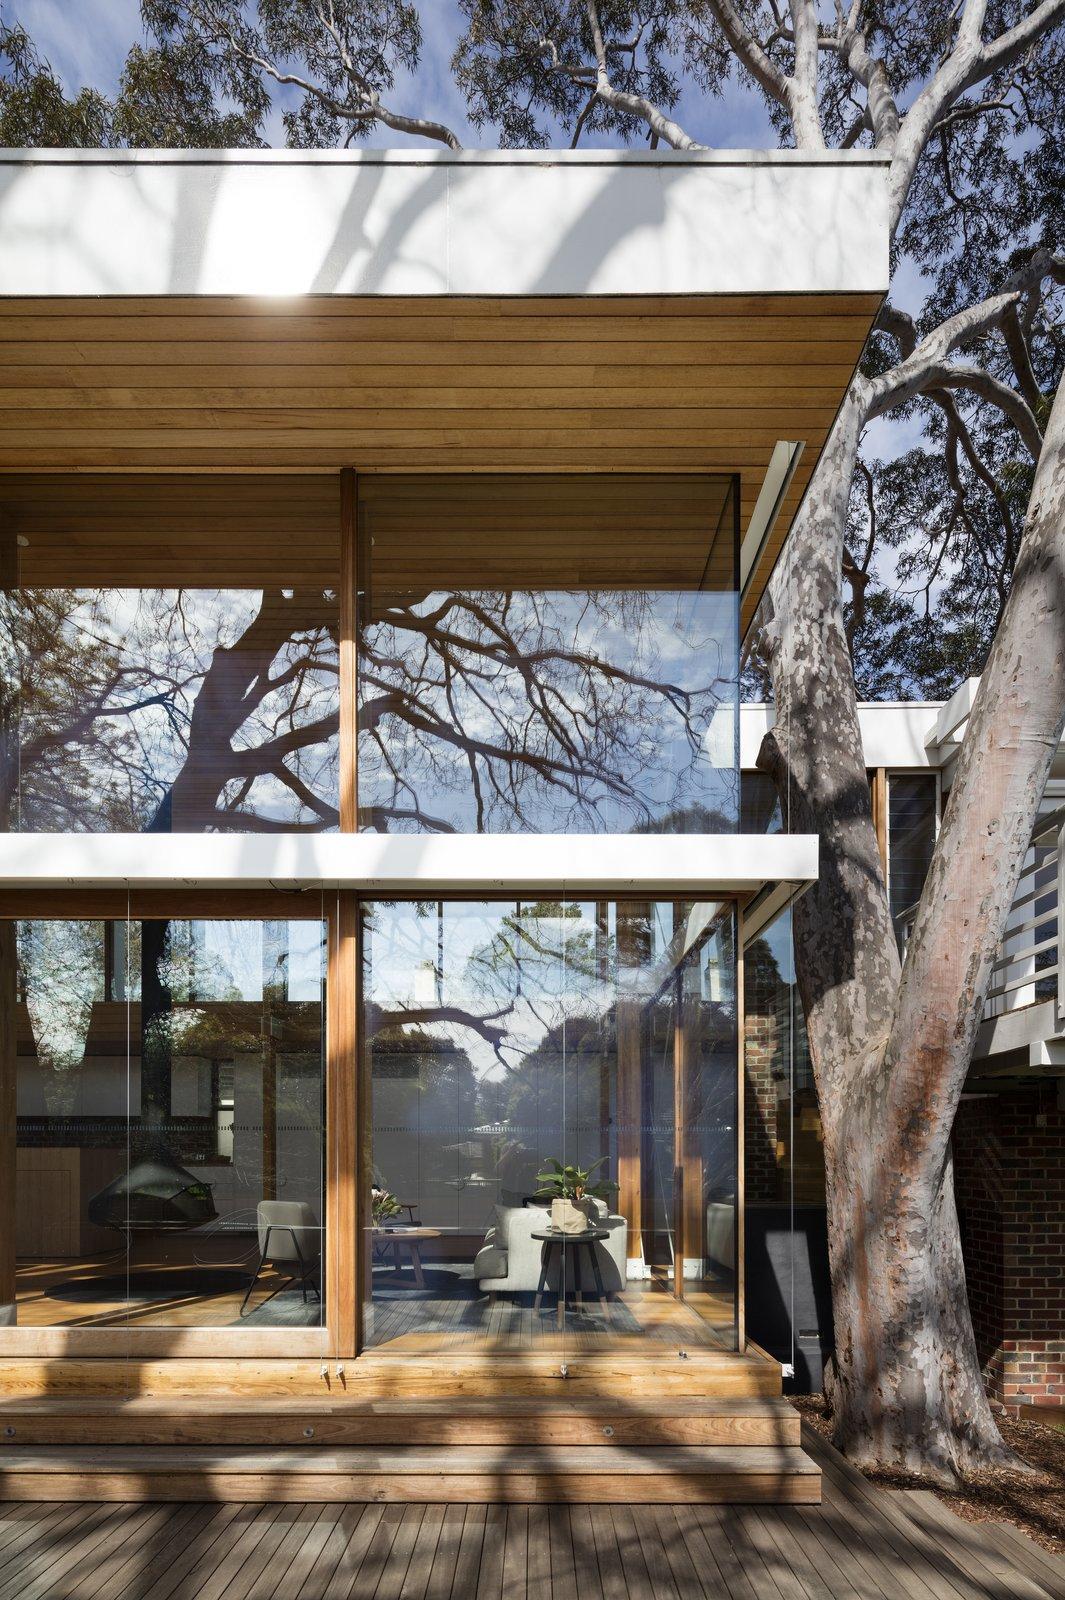 Exposed clinker brick and steel bracing convey the pragmatism of Australian, midcentury design.